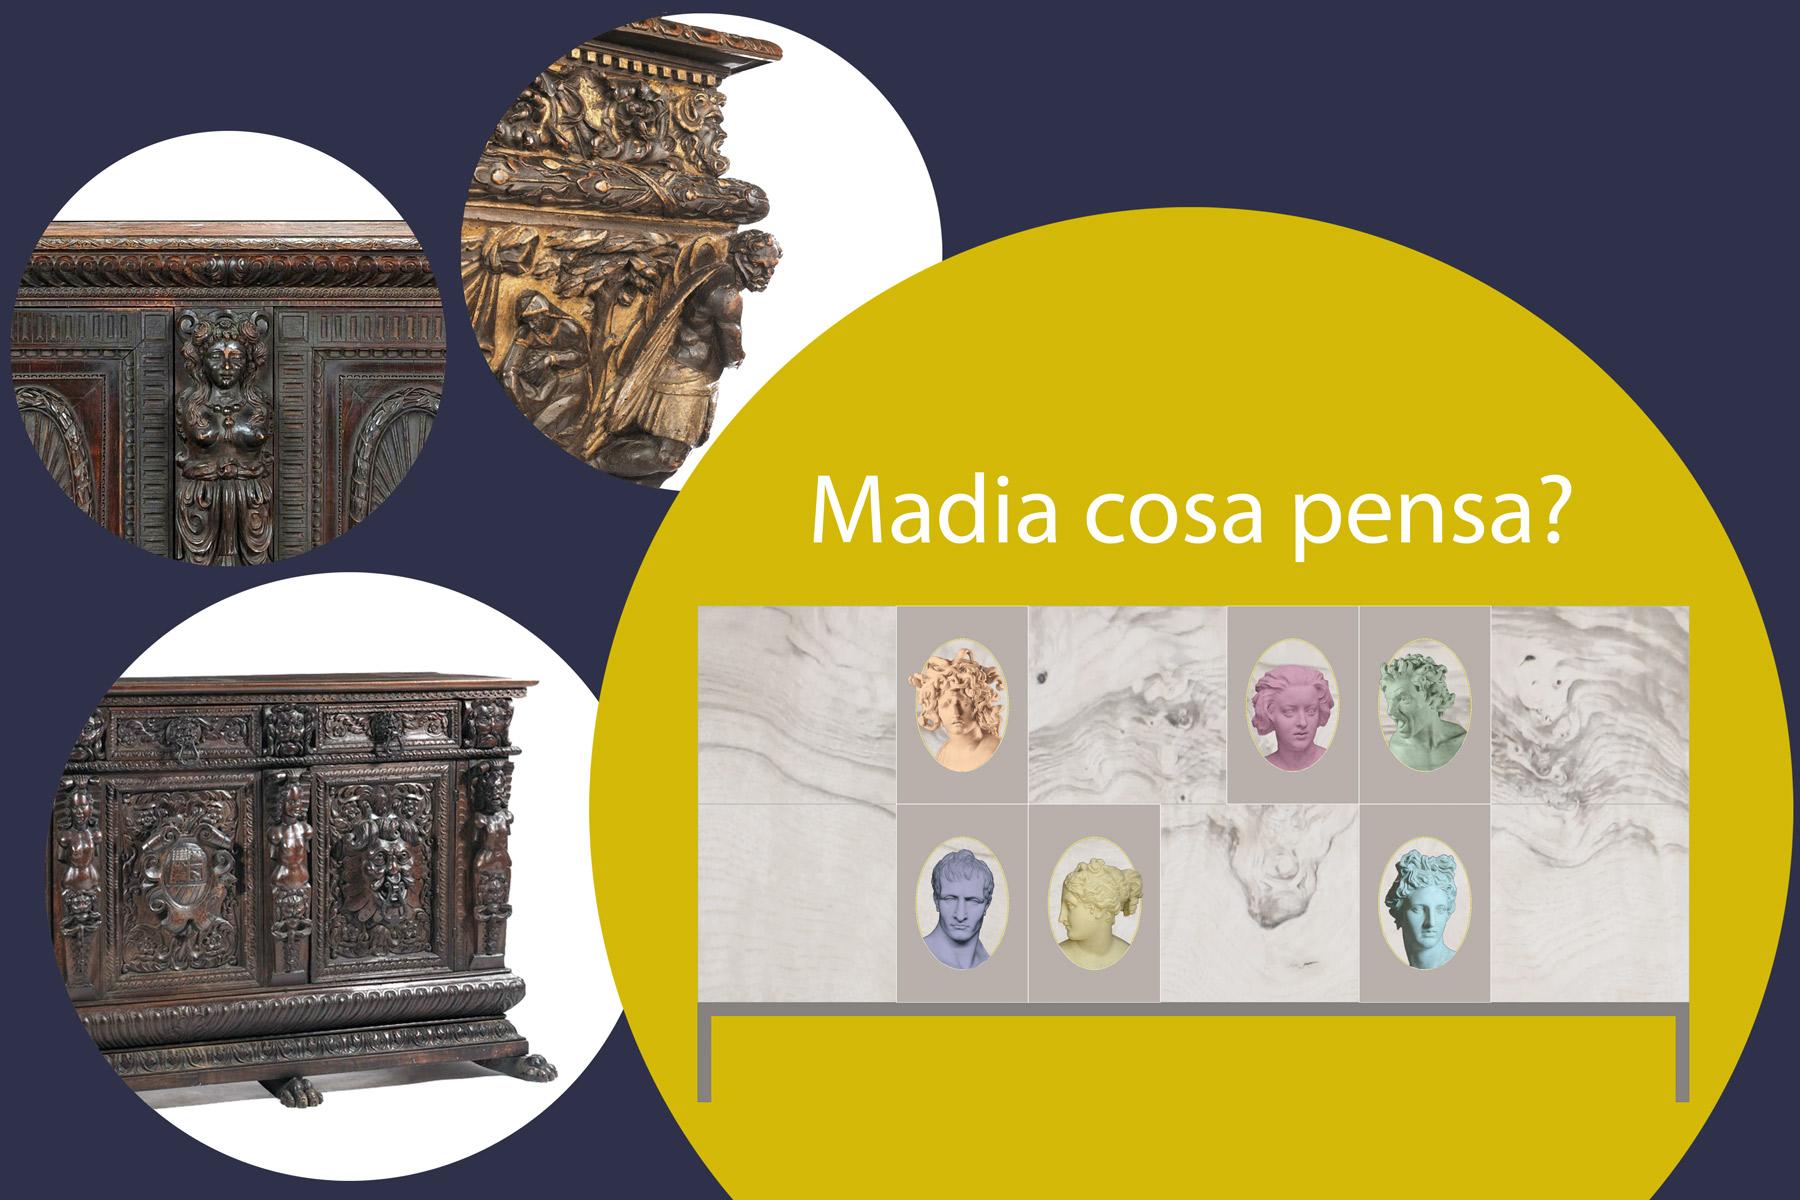 madia-cosa-pensa-1200x1800